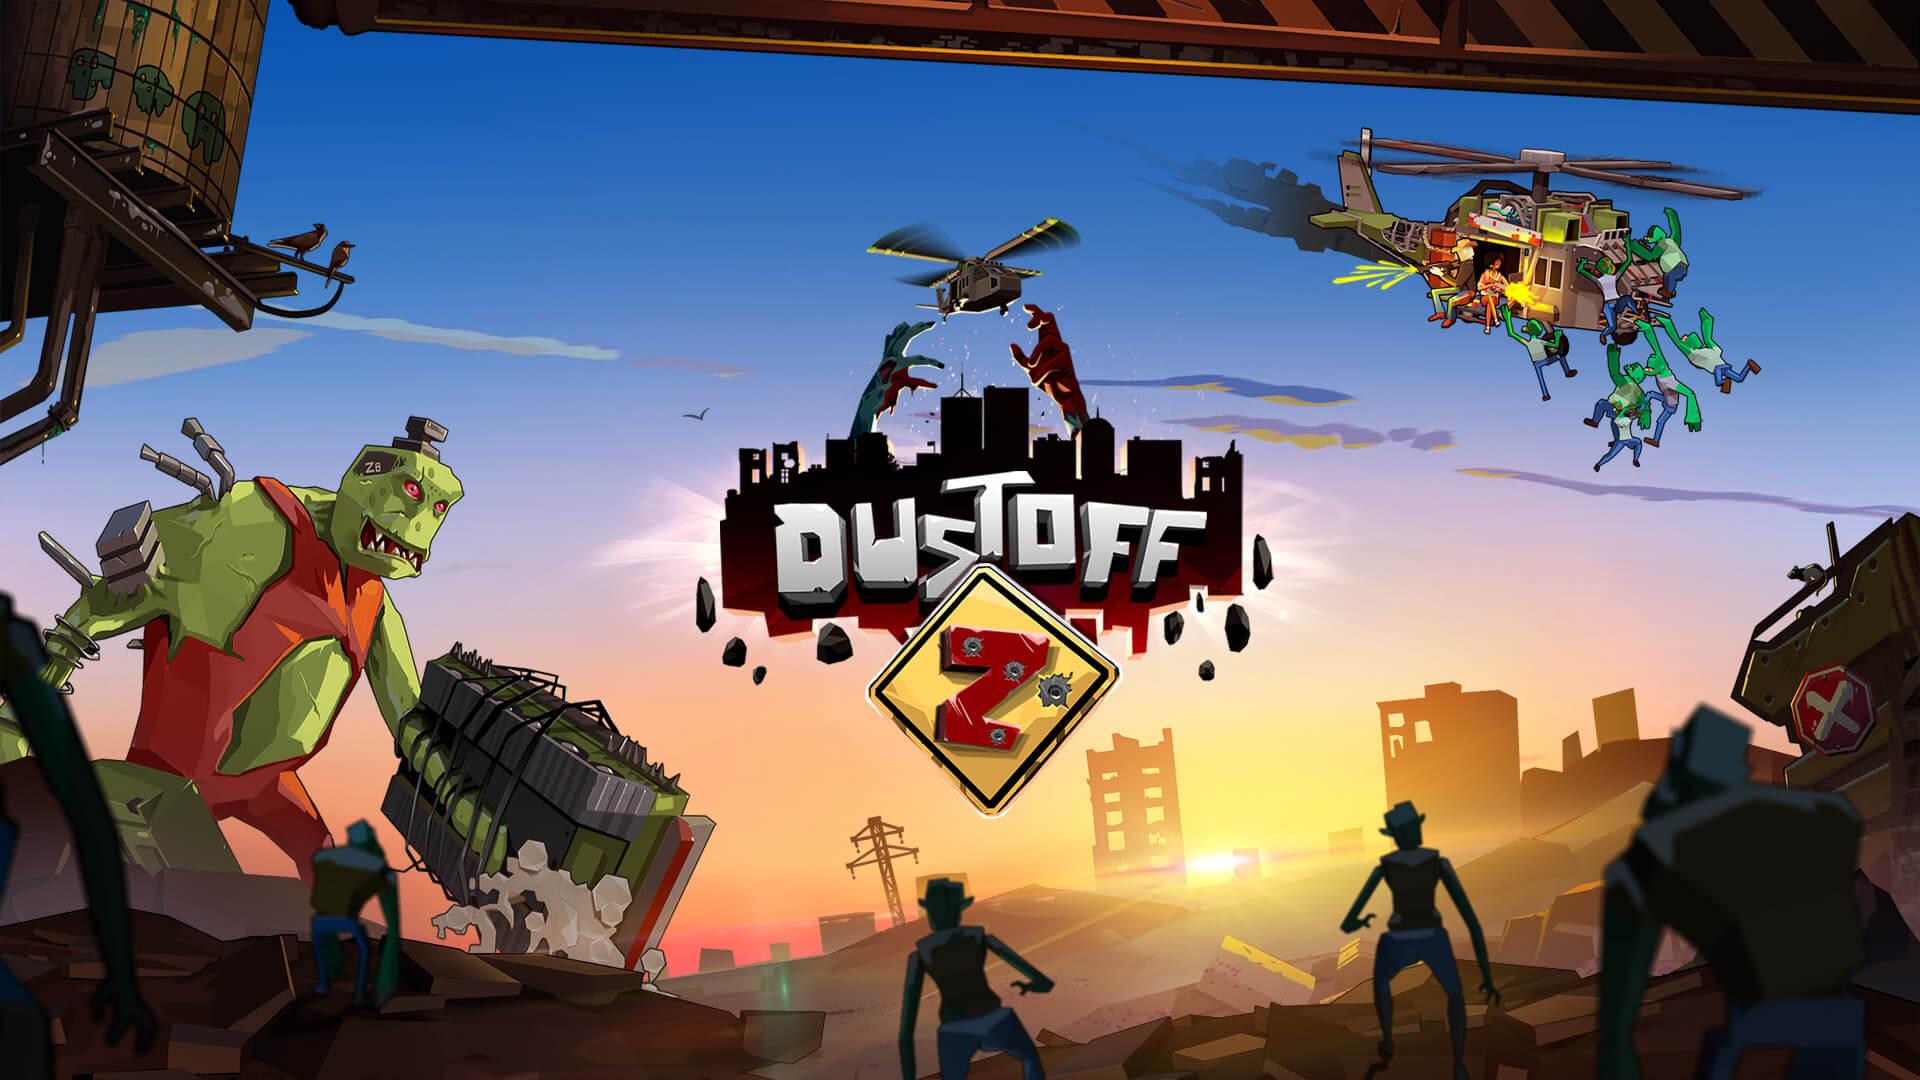 Dustoff Z Free PC Download